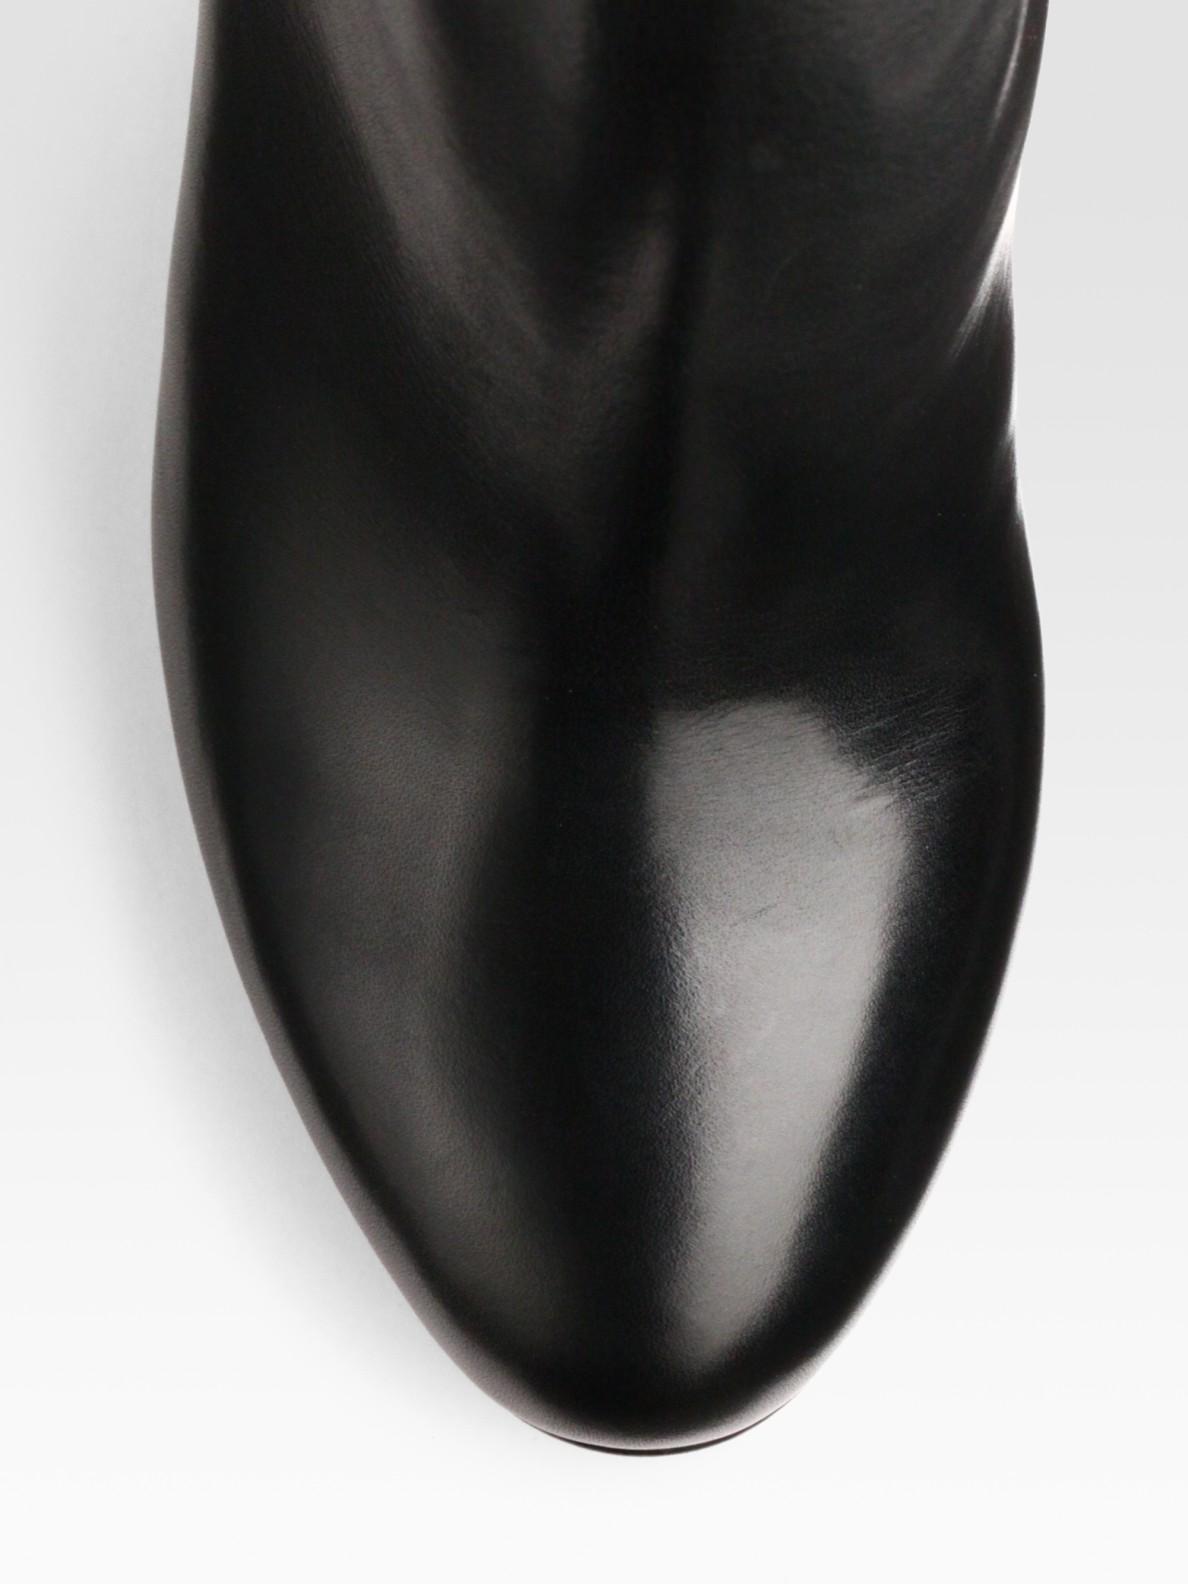 Keyword - christian louboutin wedge booties Black leather | cosmetics ...